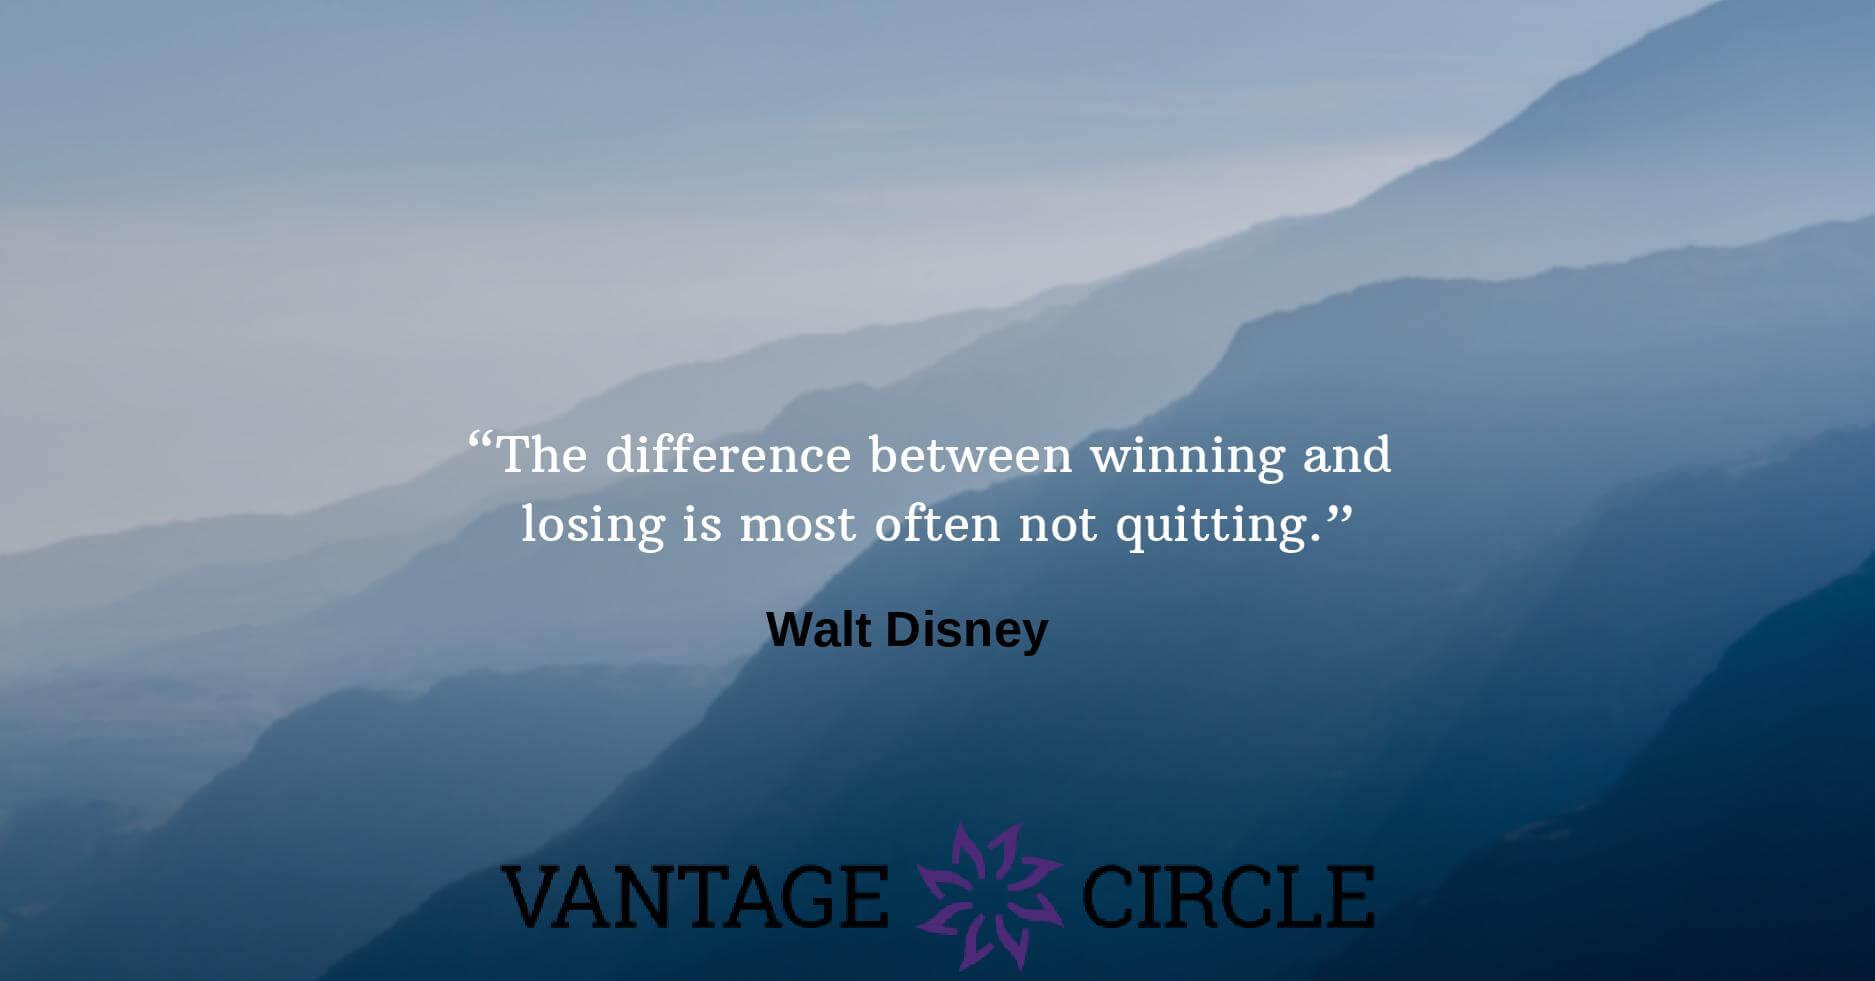 Employee-motivational-quotes-Walt-Disney